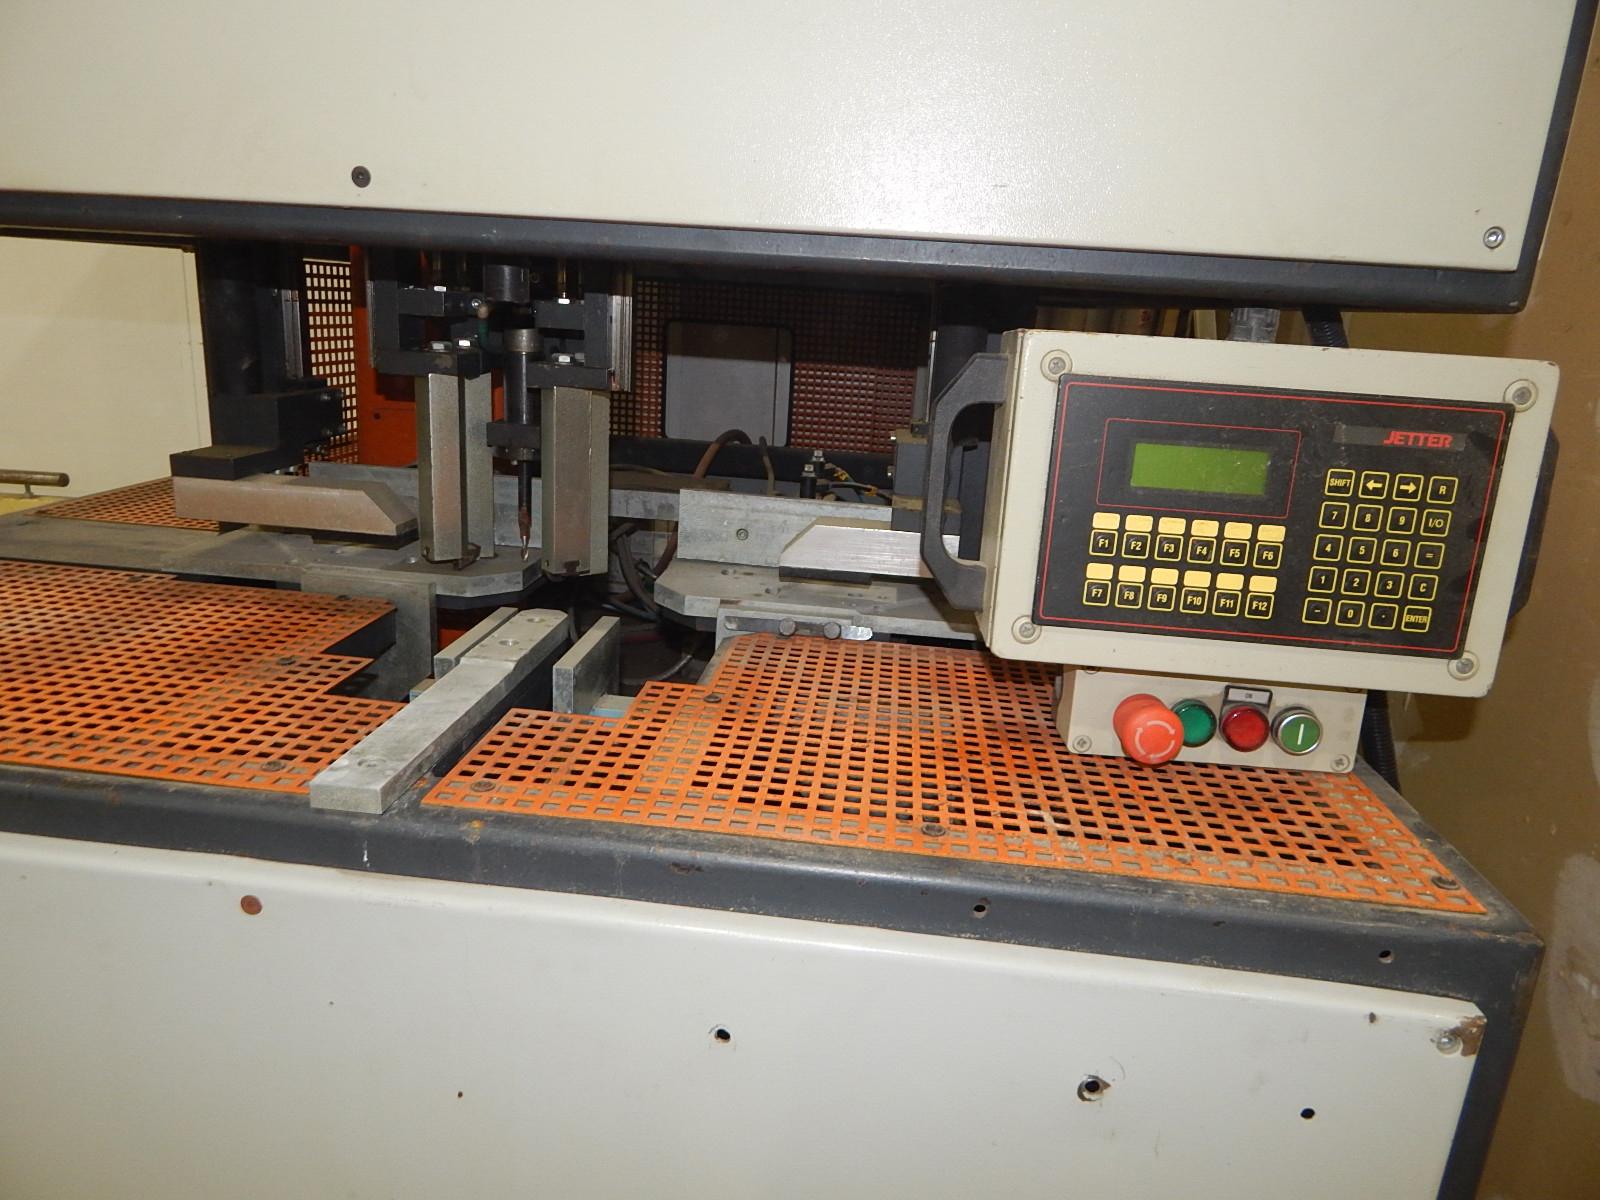 ELUMATEC (2001) TV-873 TRANSOM CLEANER WITH JETTER DIGITAL CONTROL, 400V/3PH/50HZ, S/N: 005 (CI) - Image 2 of 3